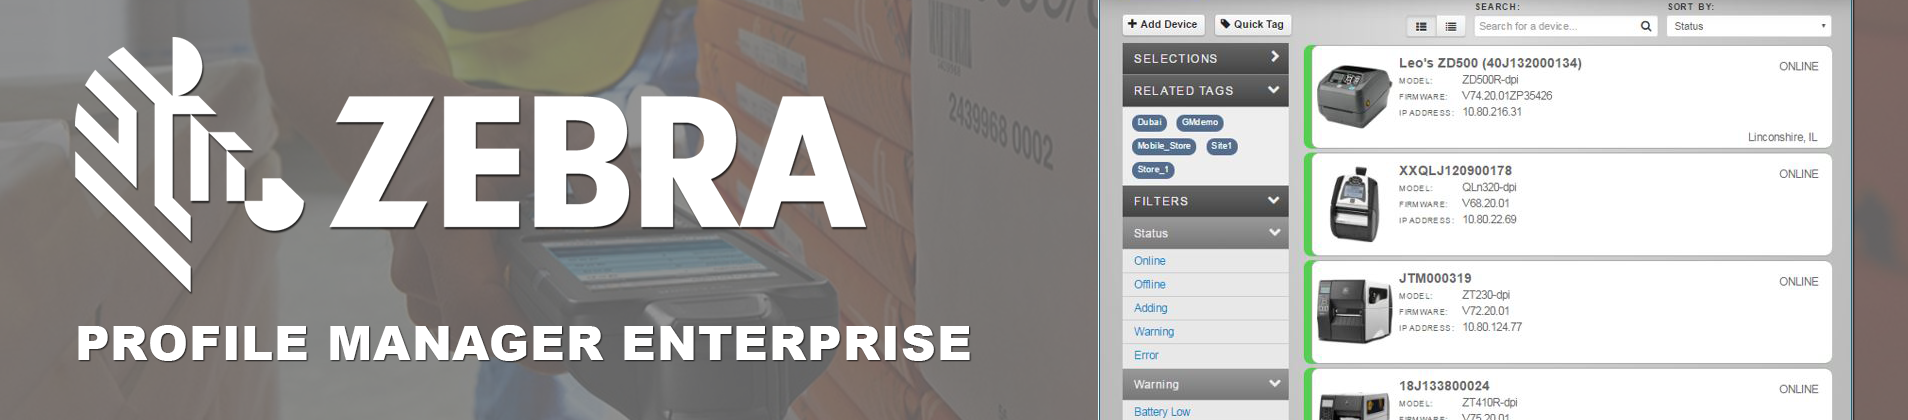 Zebra's Printer Profile Manager Enterprise - Imprint Enterprises